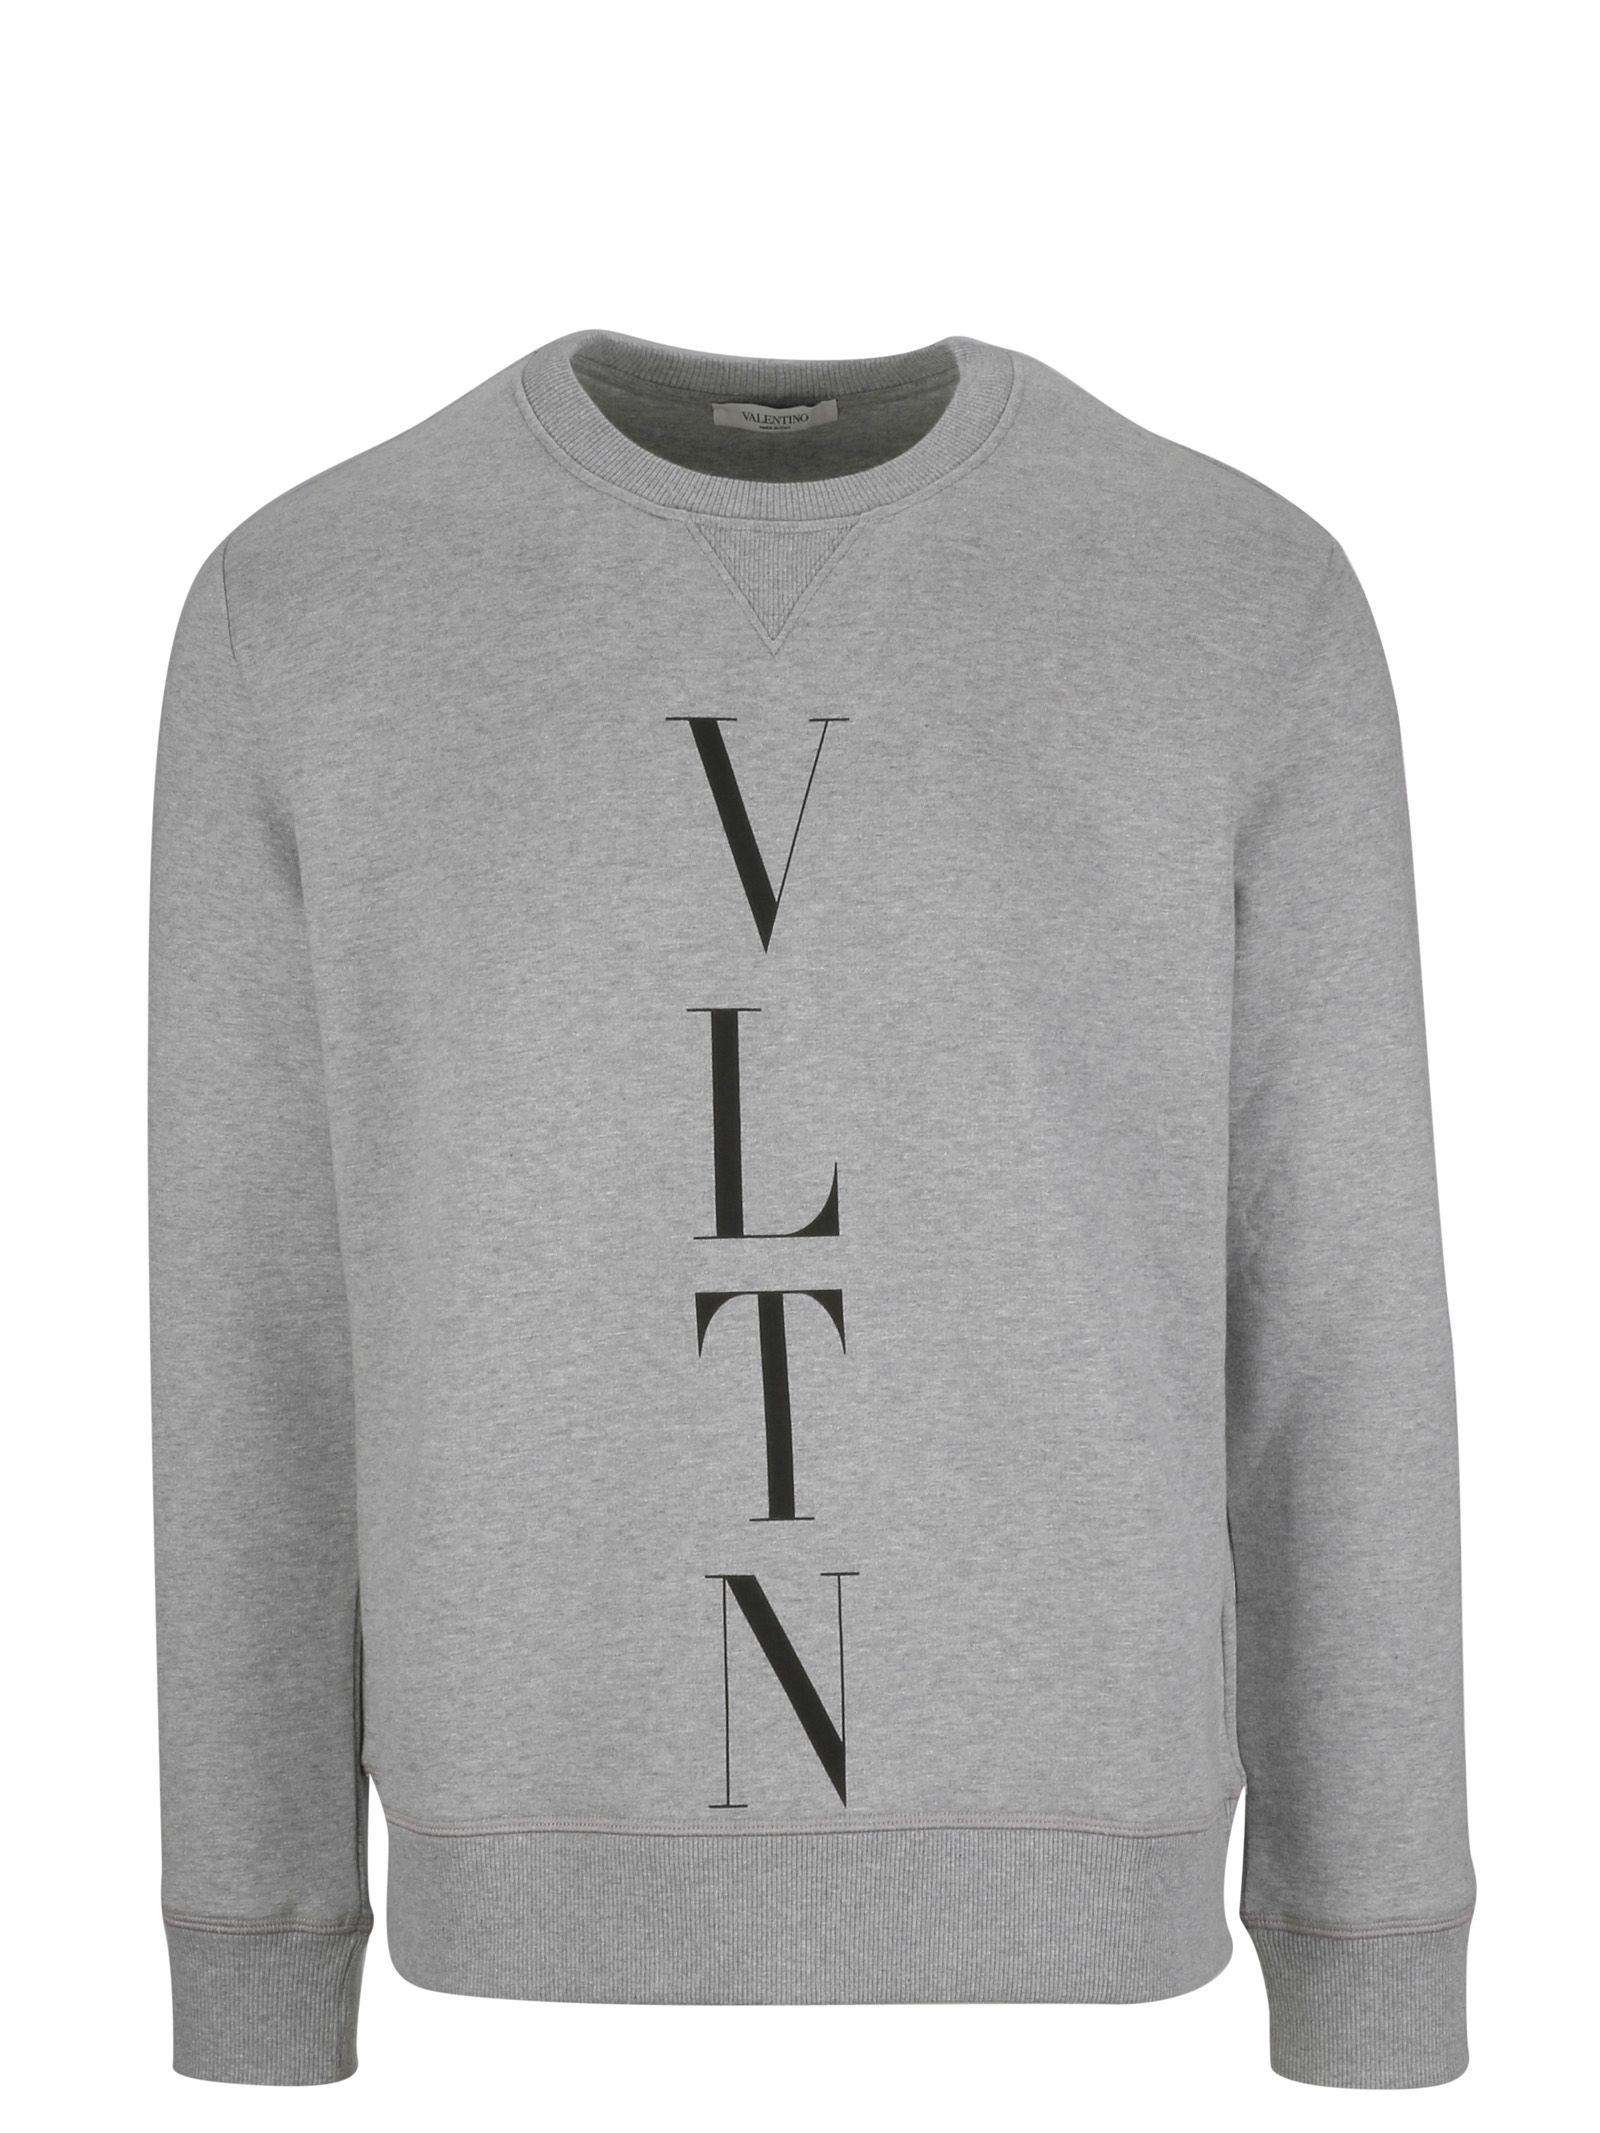 Valentino Intarsia Sweatshirt